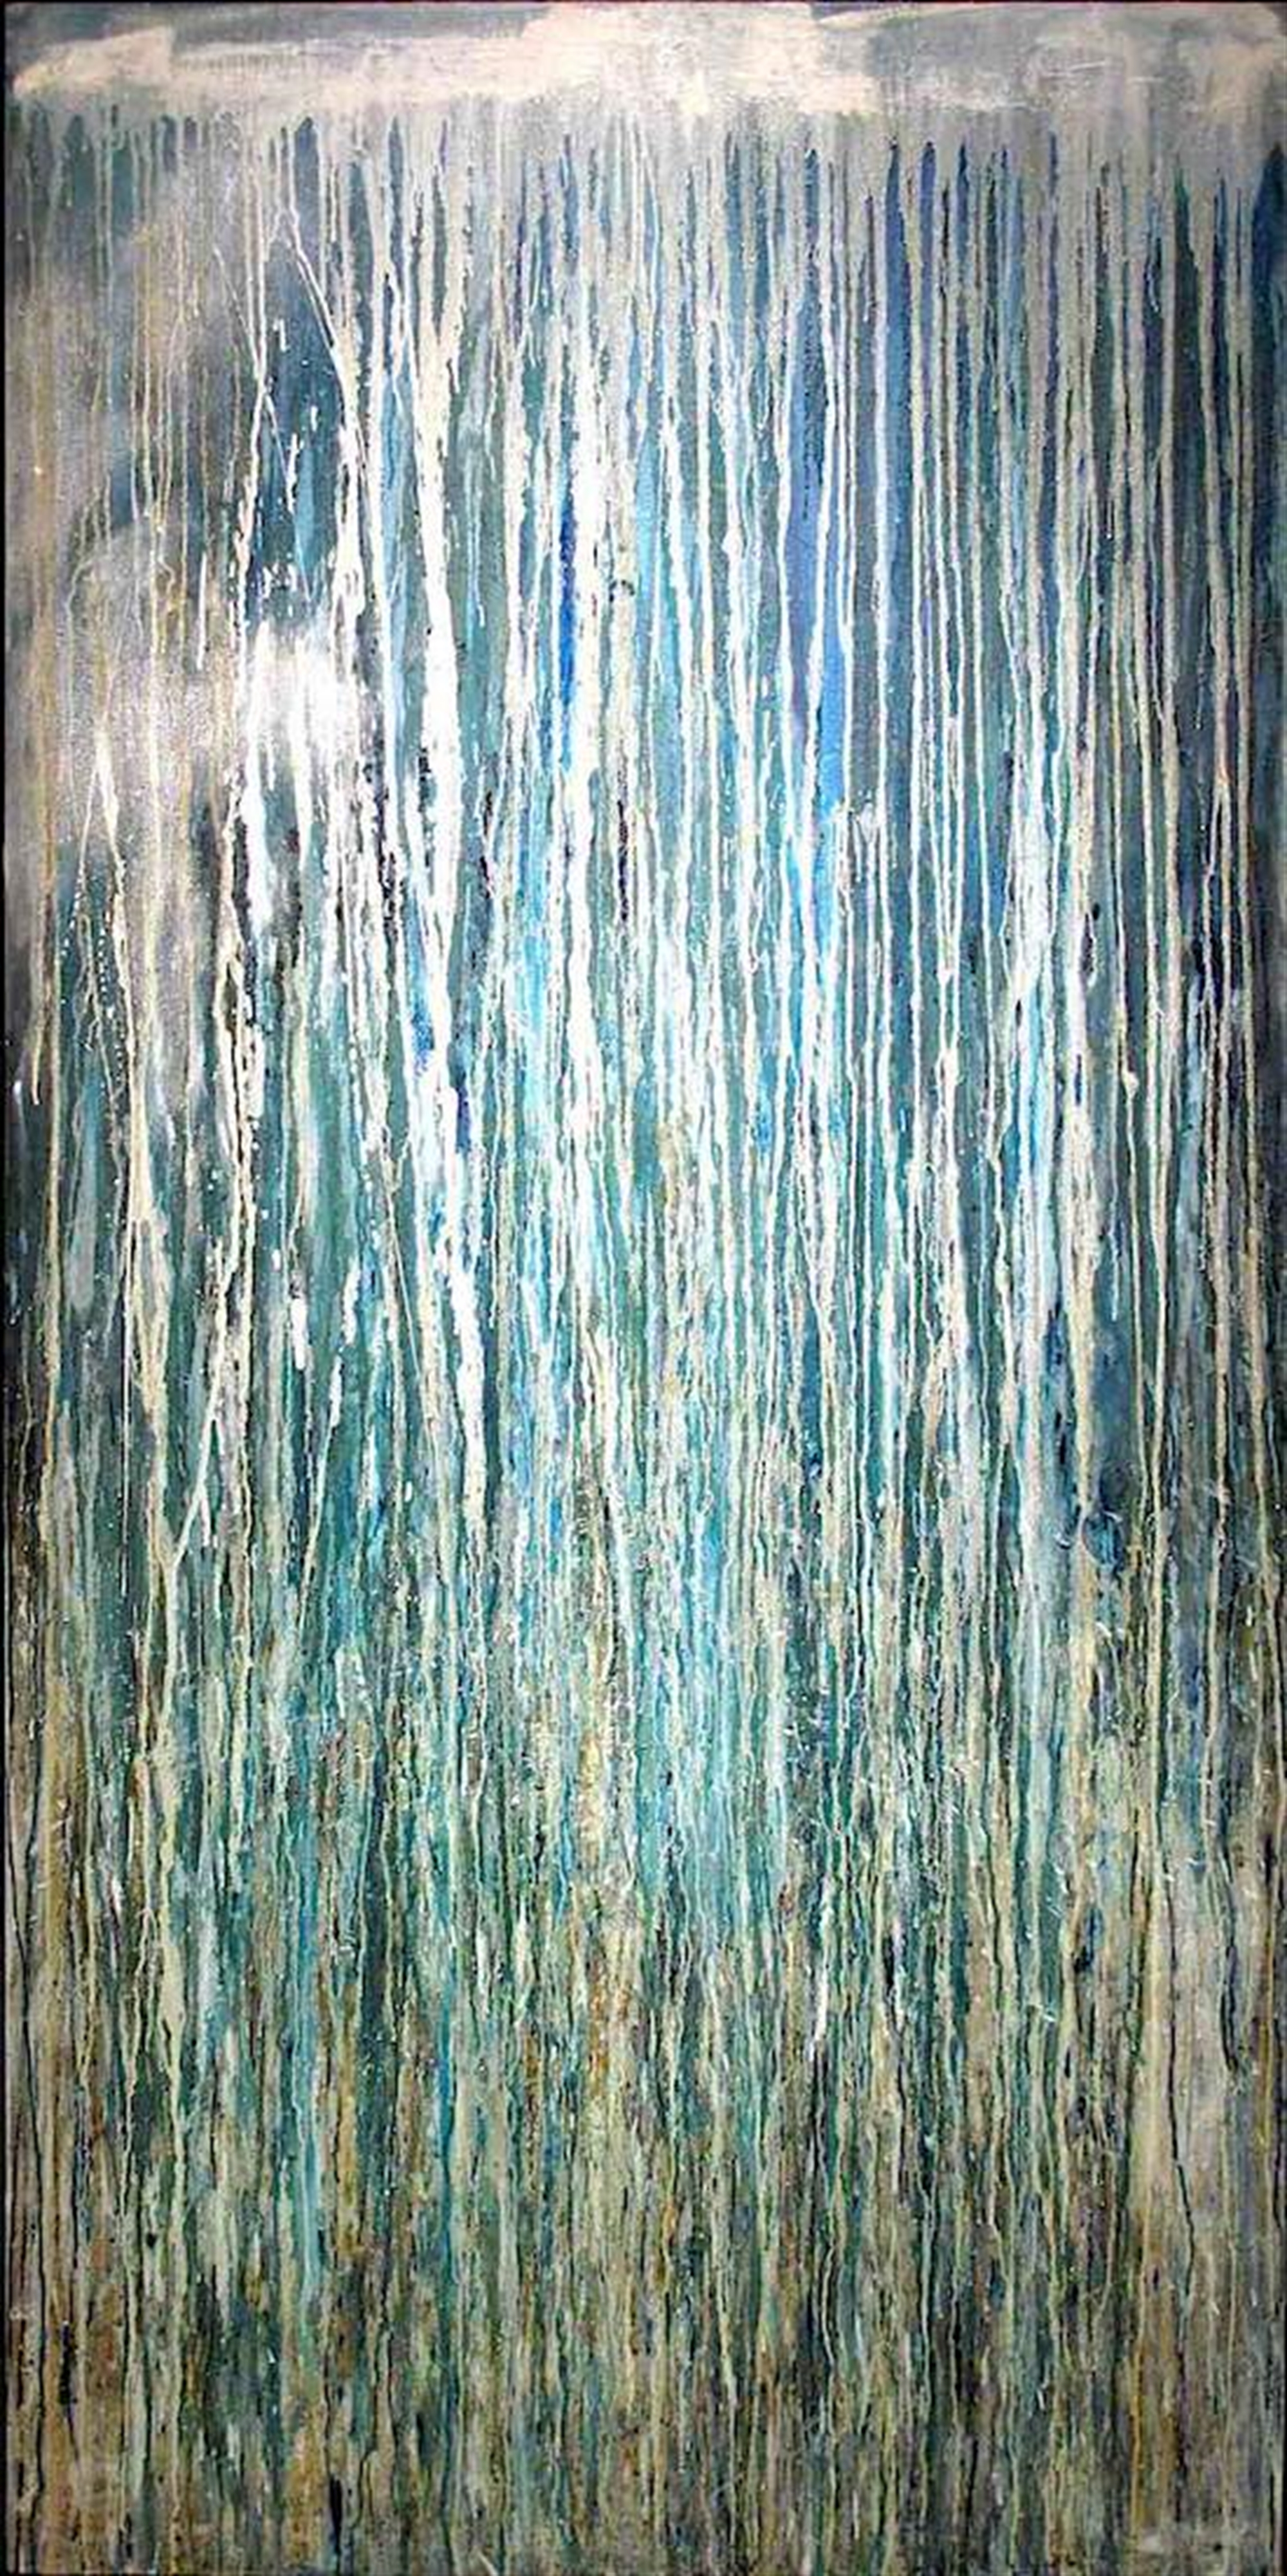 Waterfall by Pat Steir